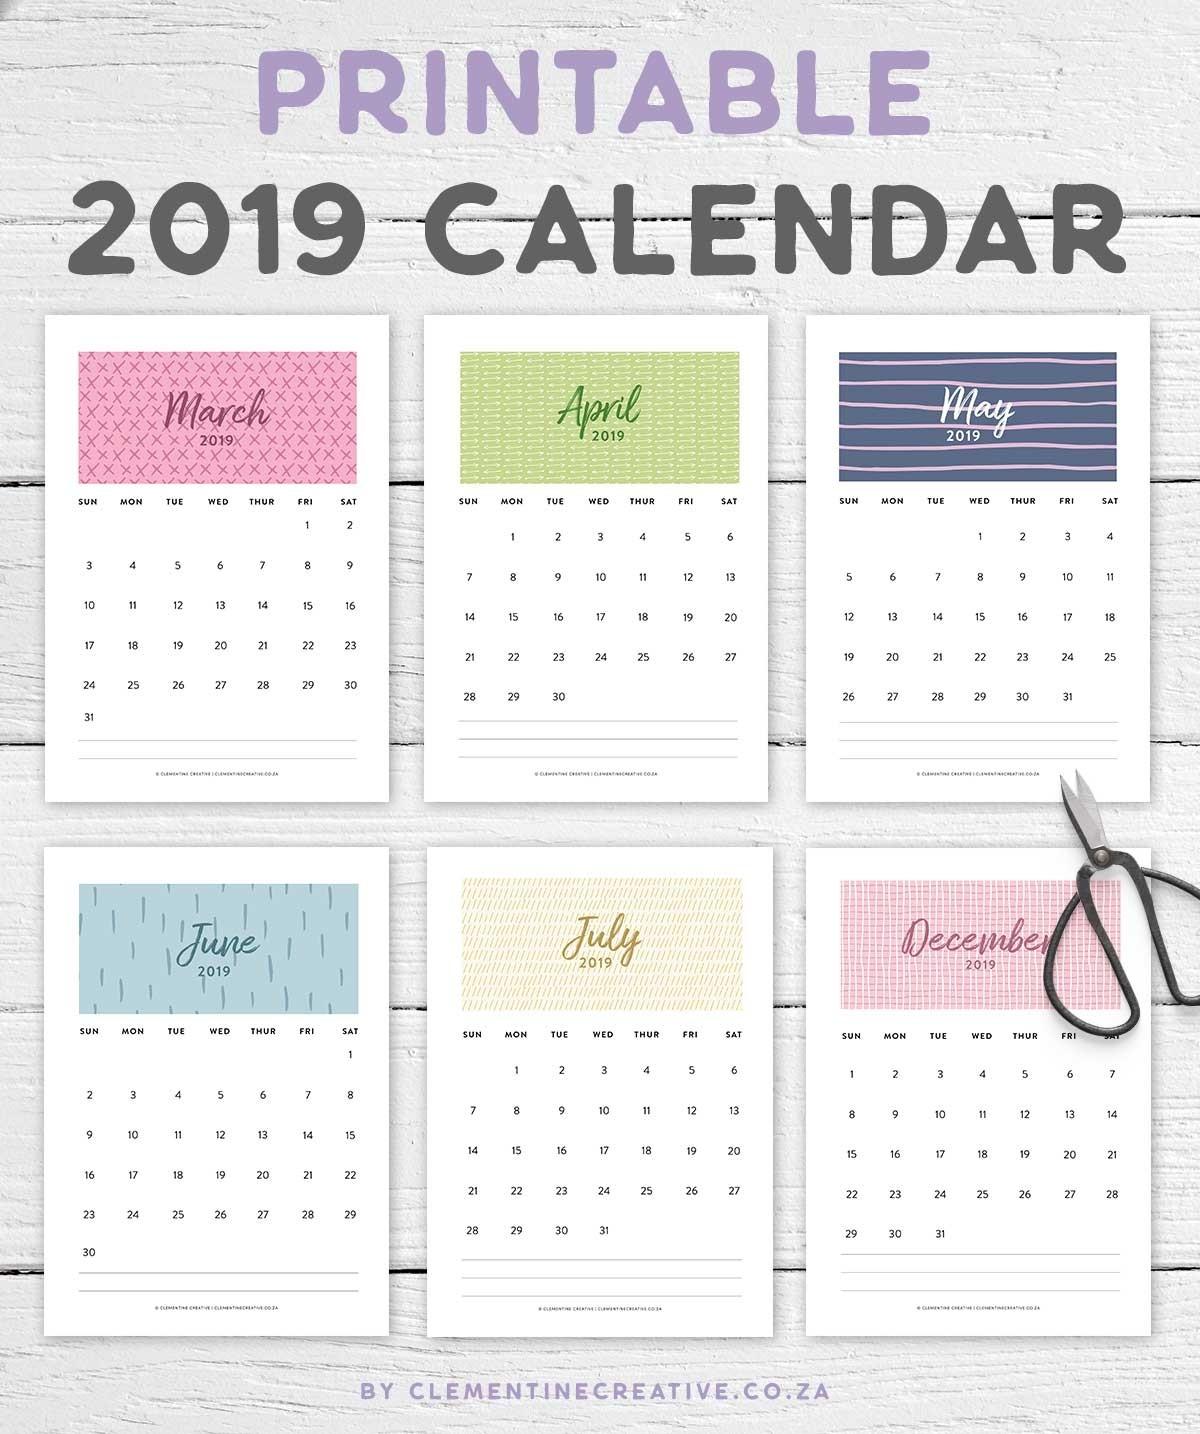 Printable 2019 Calendar | A Pretty Monthly Calendar  Pretty Monthly Calendar